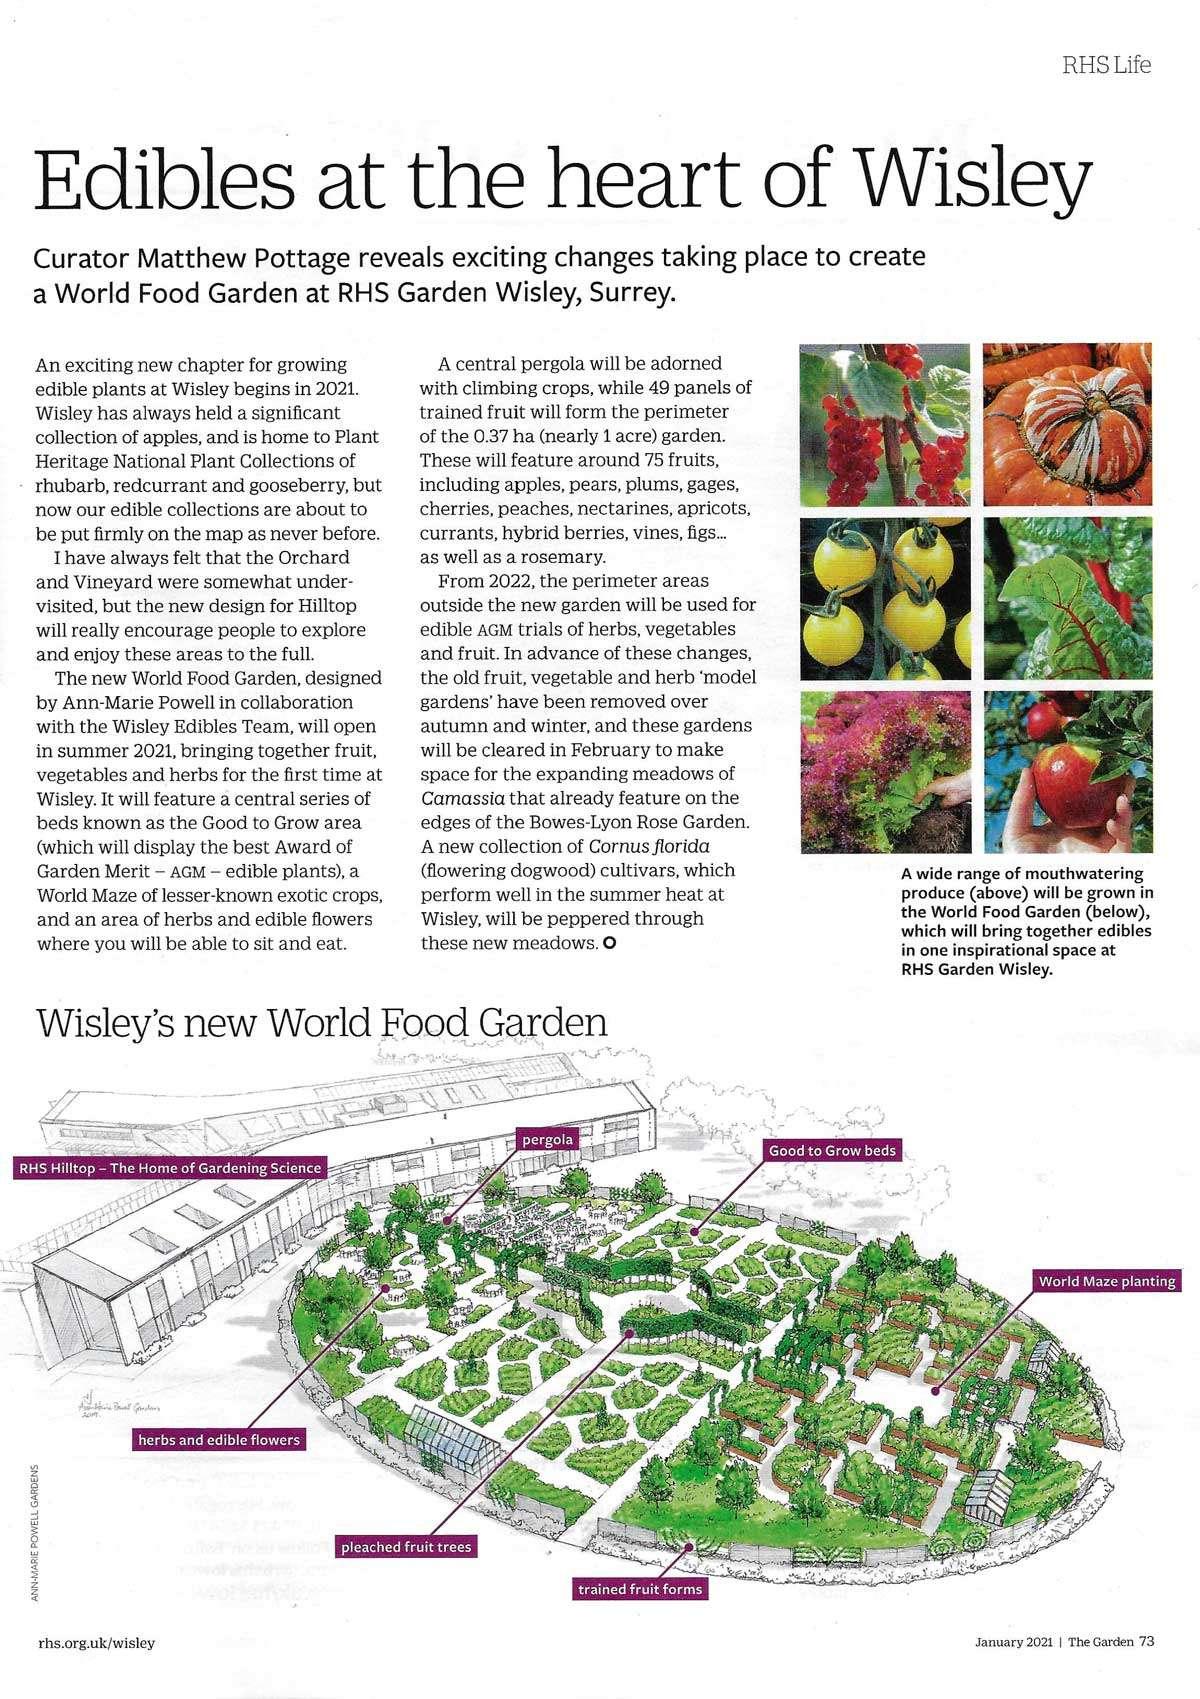 Wisley curator Matthew Pottage in The Garden magazine of new world food garden